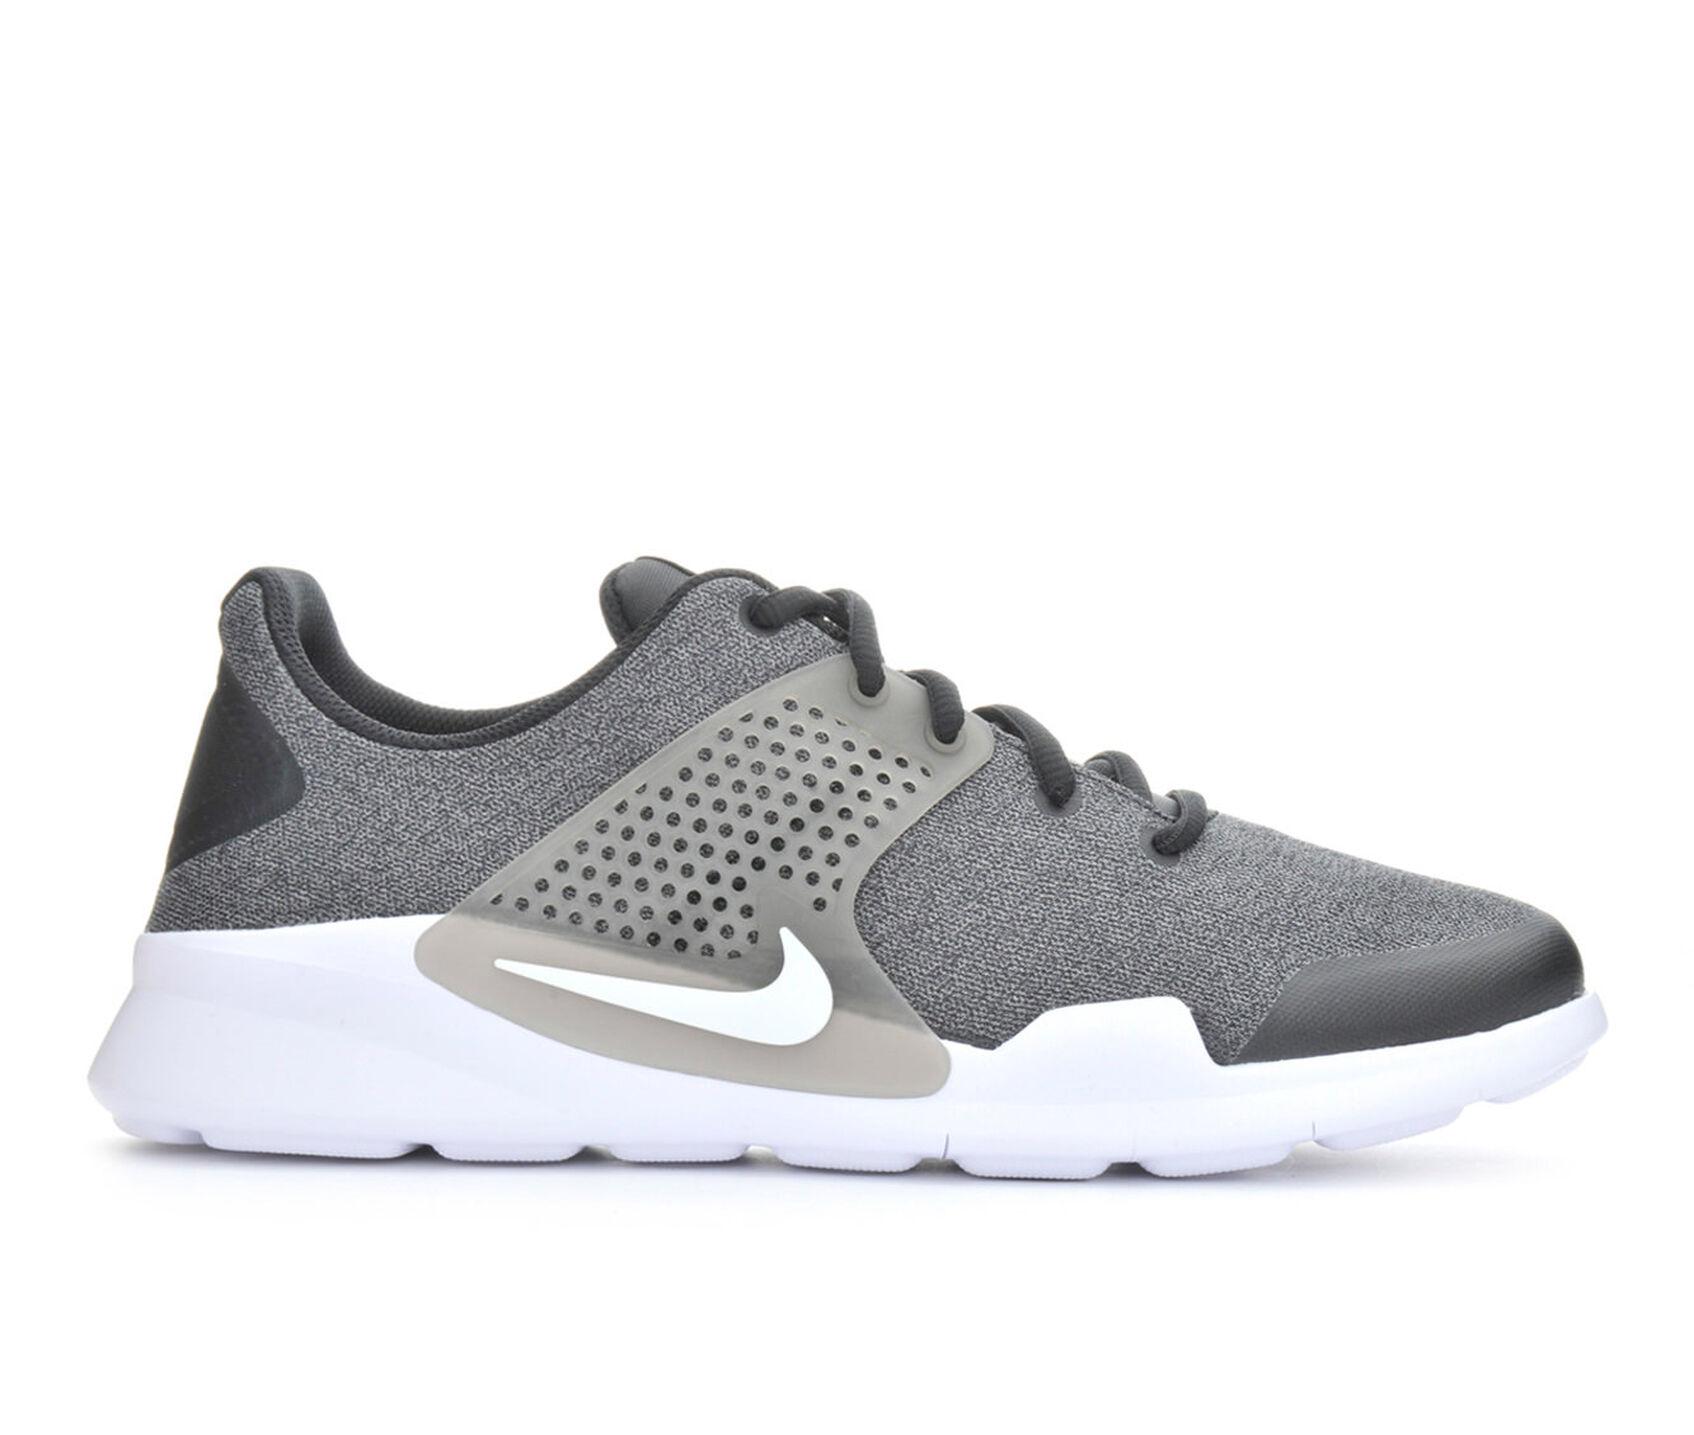 eeacd5d4c252 ... Nike Arrowz Sneakers. Previous